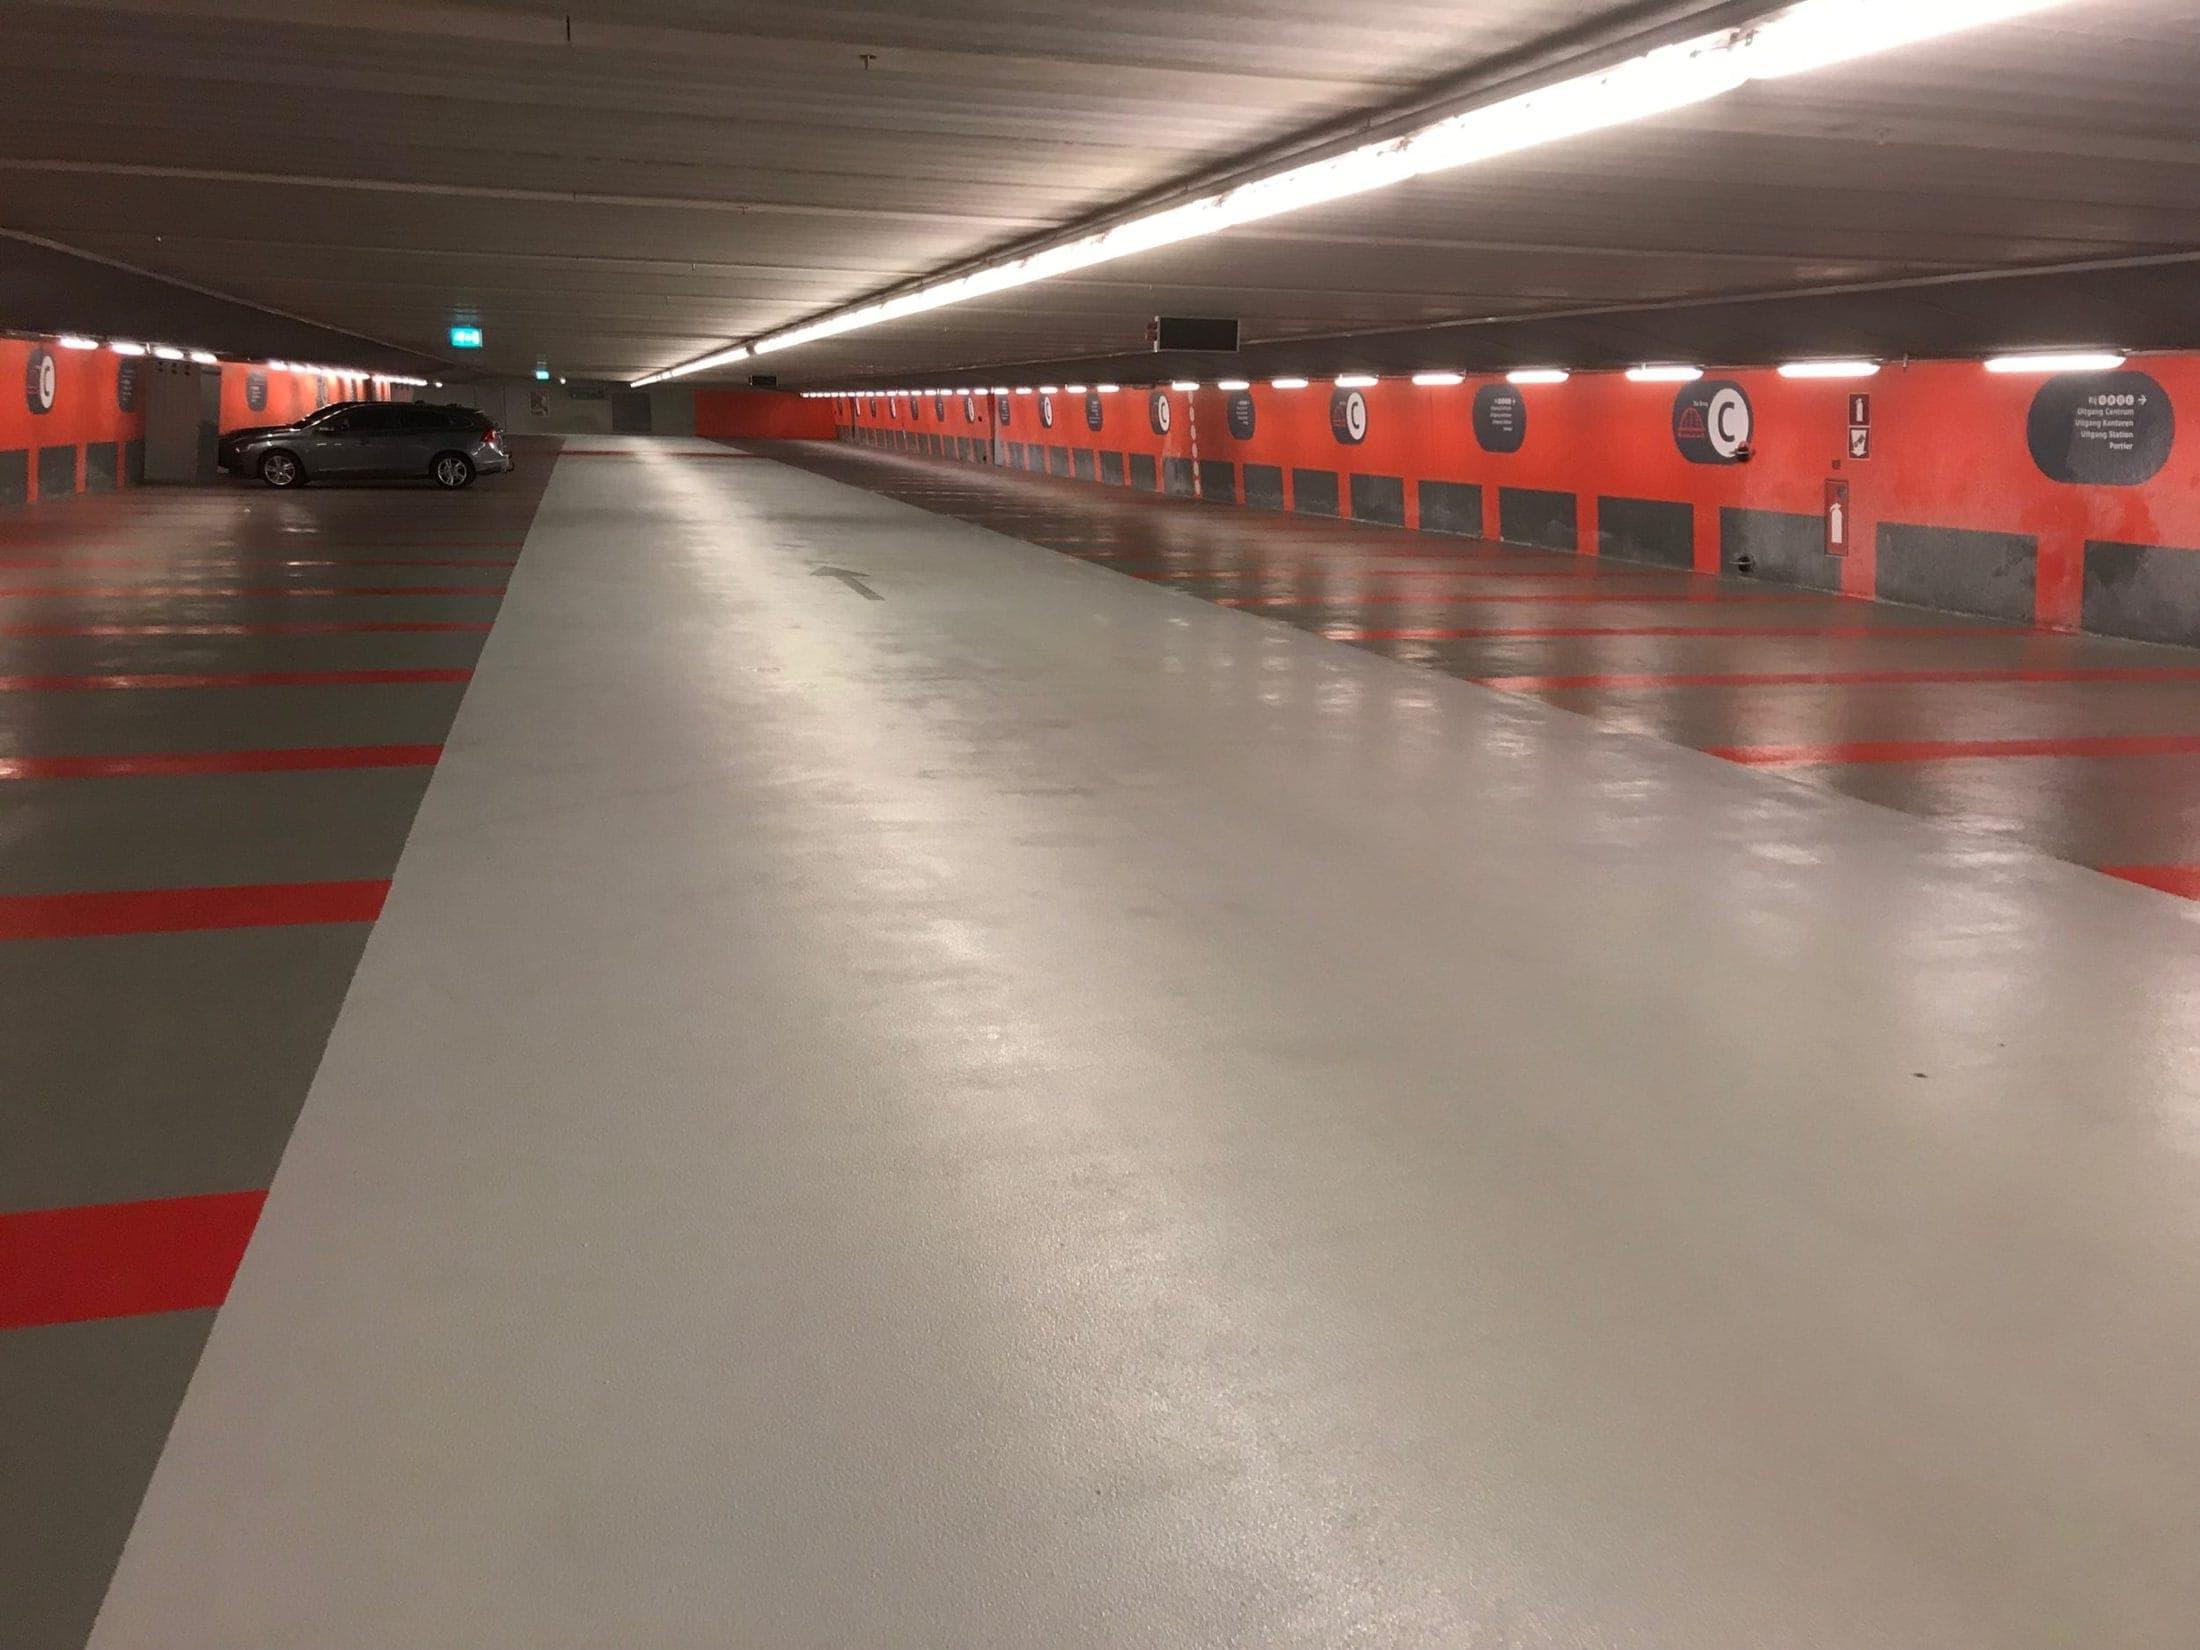 Fase 1 van renovatie parkeergarage Arnhem Centraal voltooid.